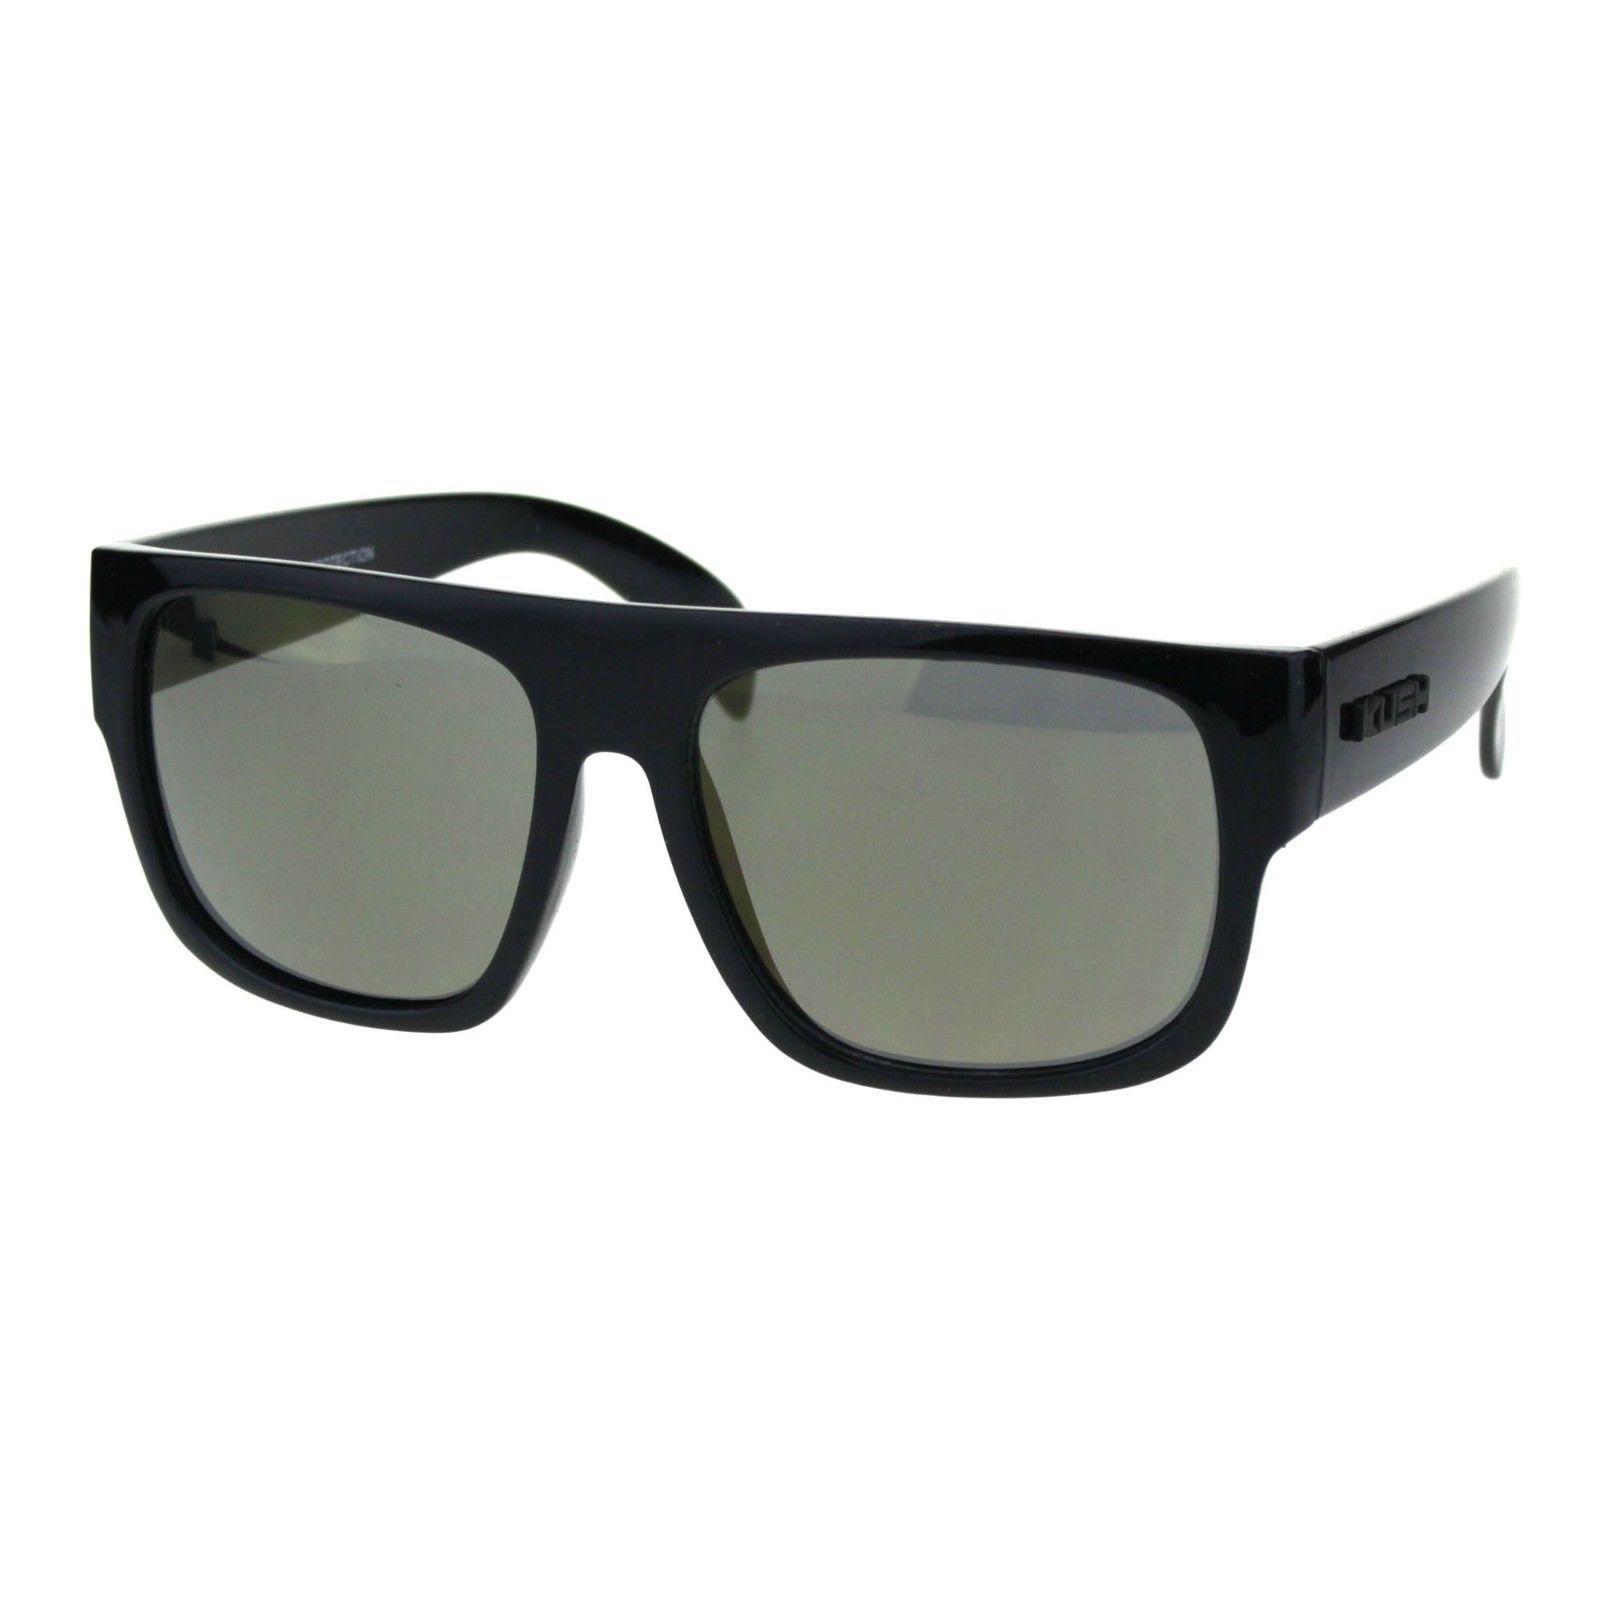 KUSH Sunglasses Mens Mirrored Lens Black Square Frame Shades UV 400